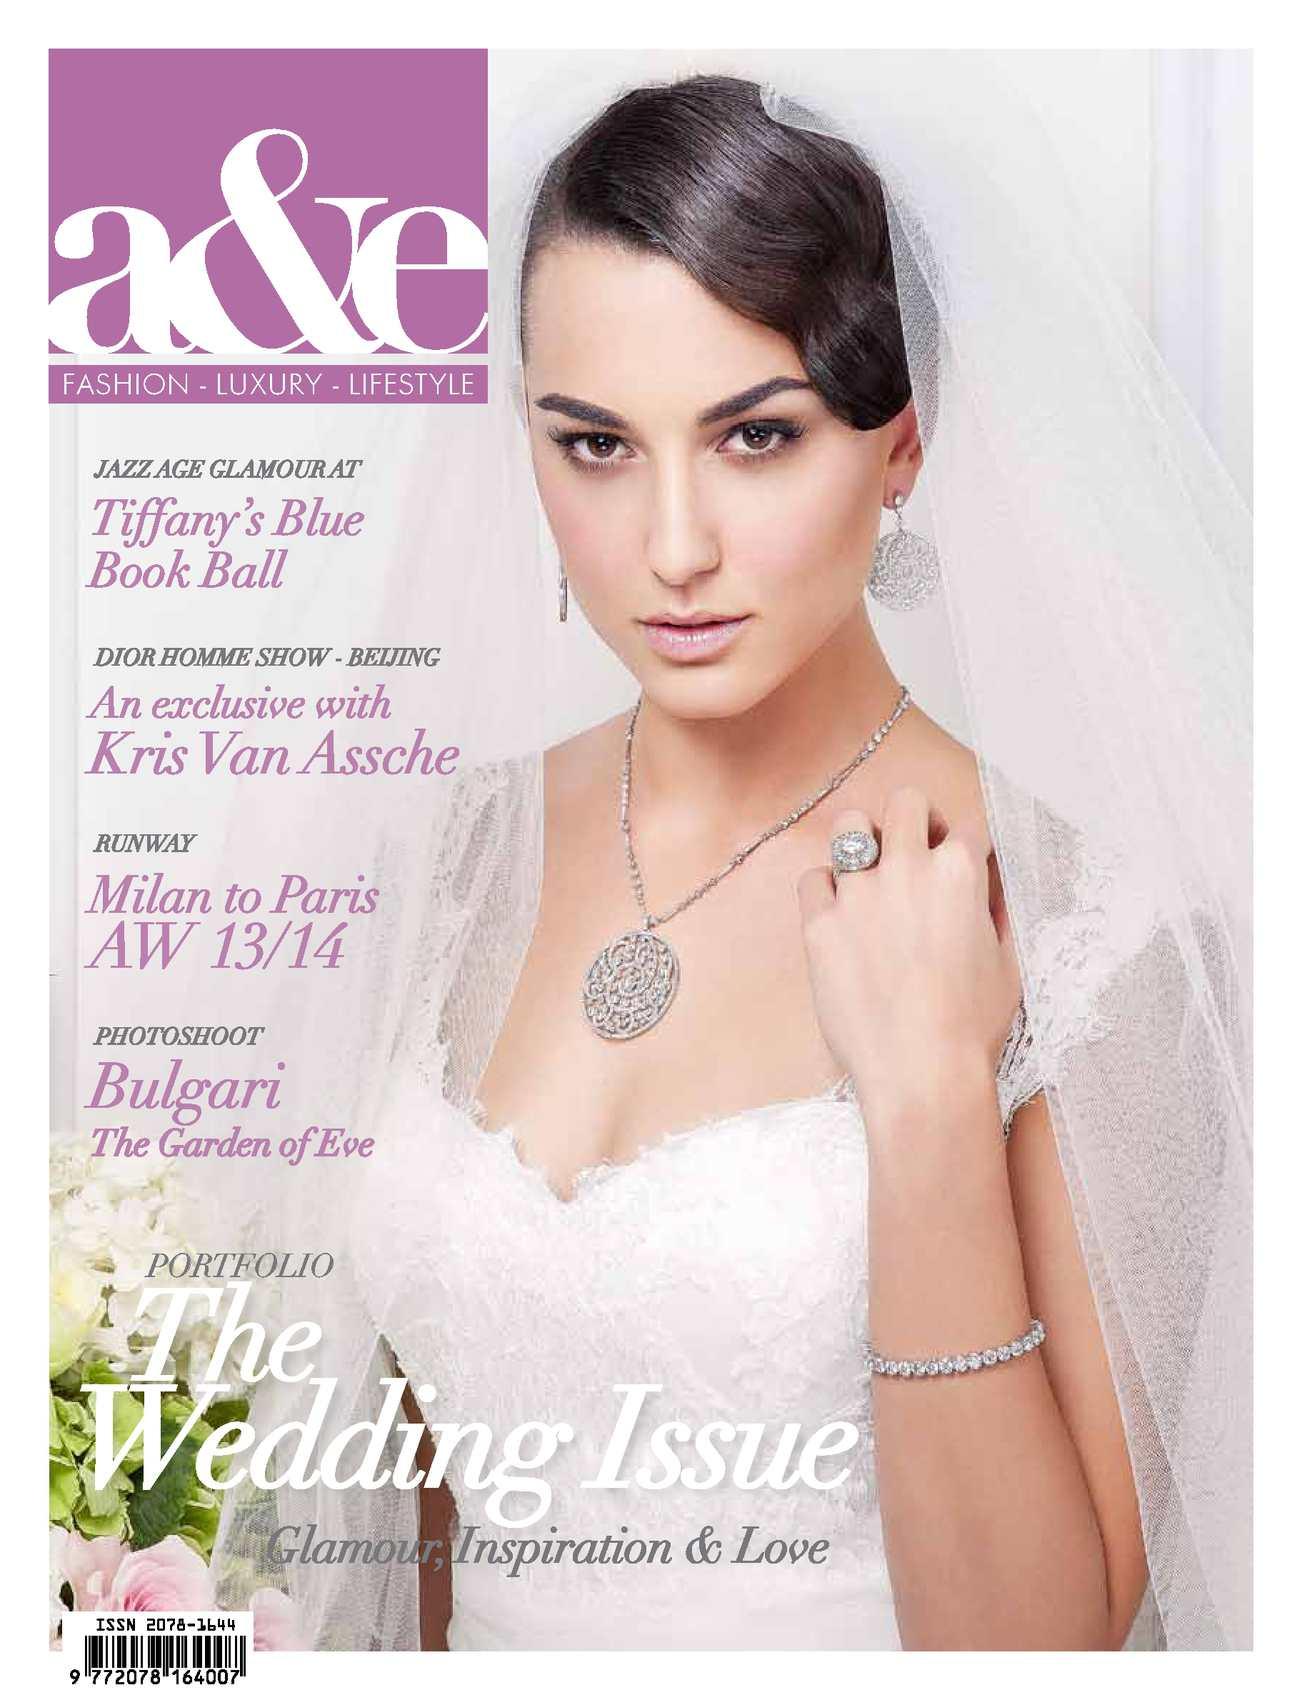 28dff7457d Calaméo - A E (Adam Eve) Magazine Issue 44